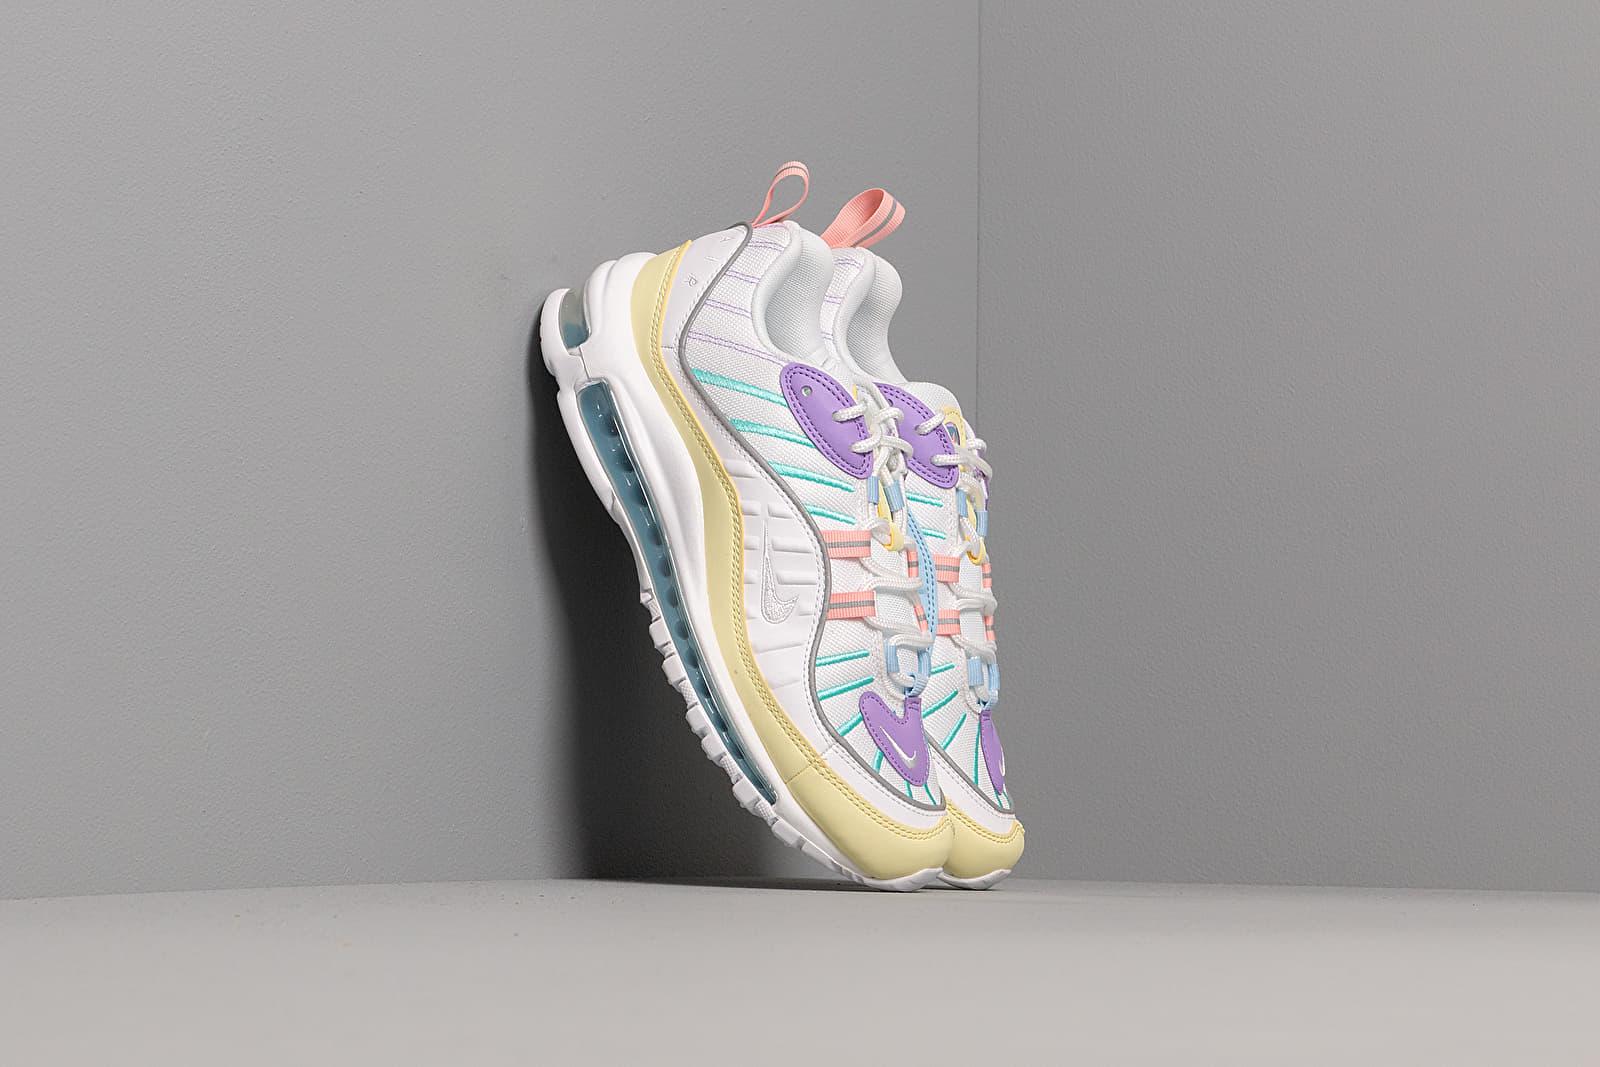 Nike W Air Max 98 Luminous Green White Atomic Violet | Footshop